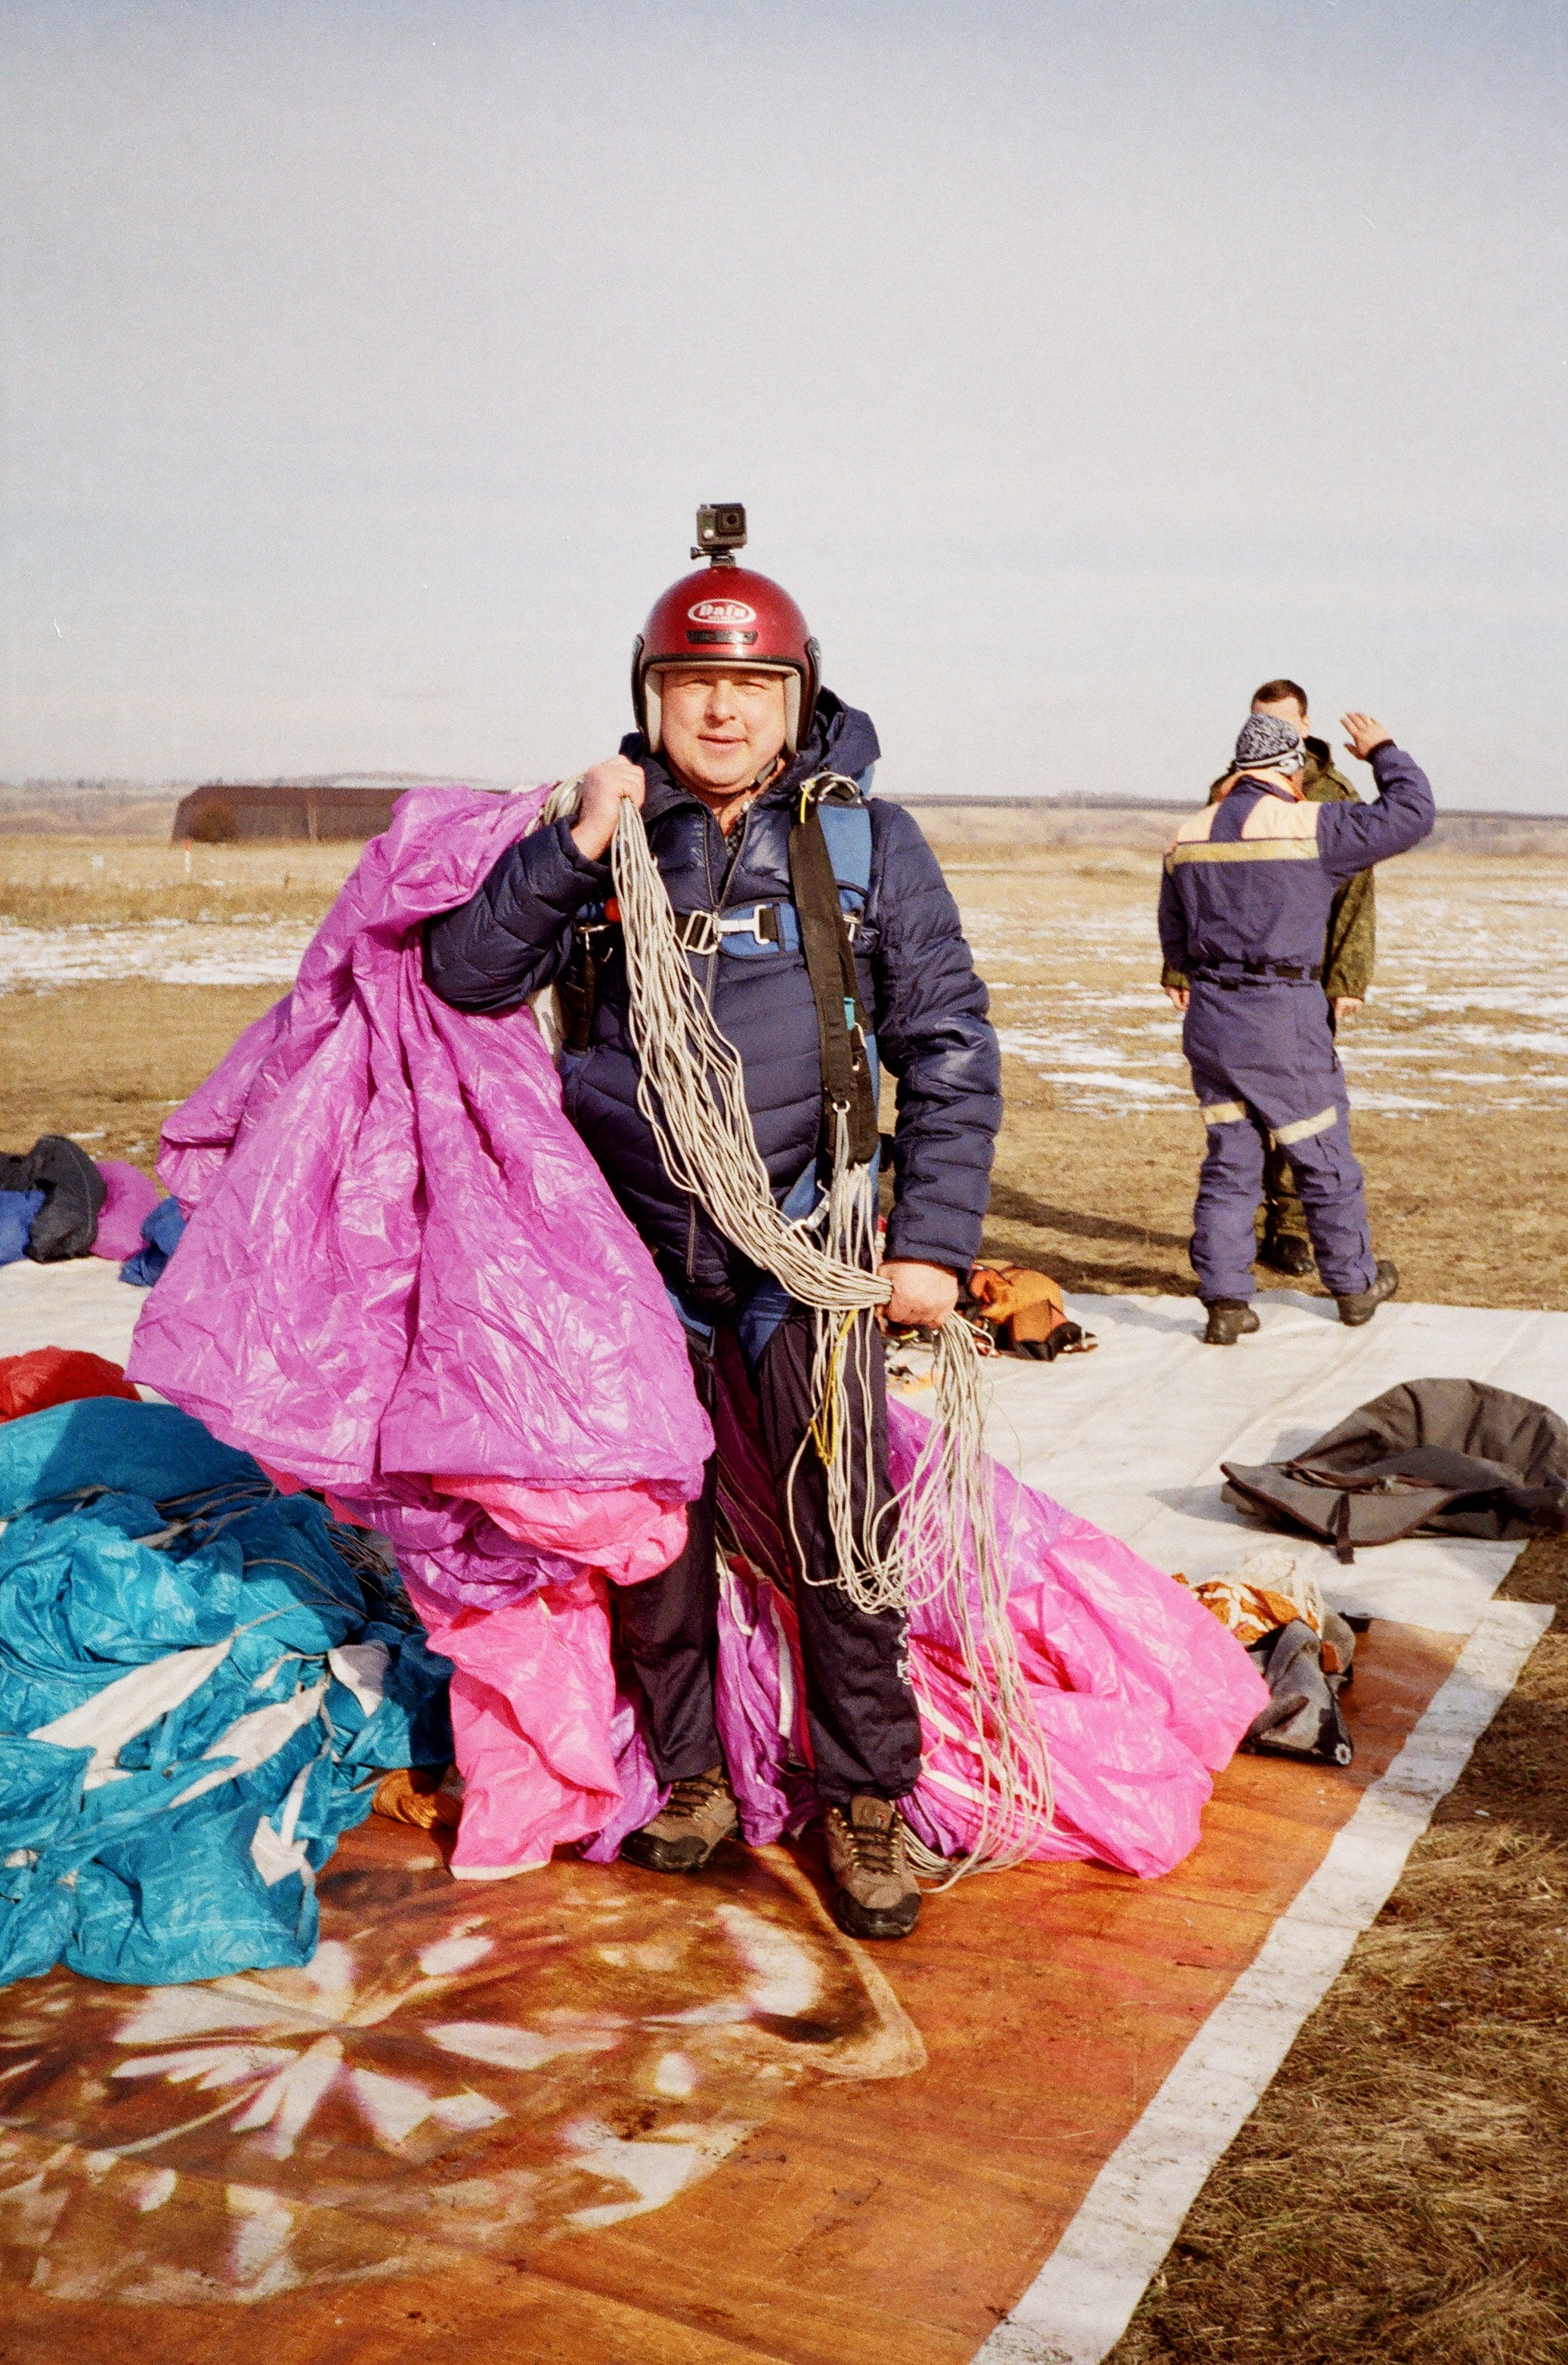 Красноярск Аэродром ДОСААФ Манский После 16-го прыжка.18.10.2015г